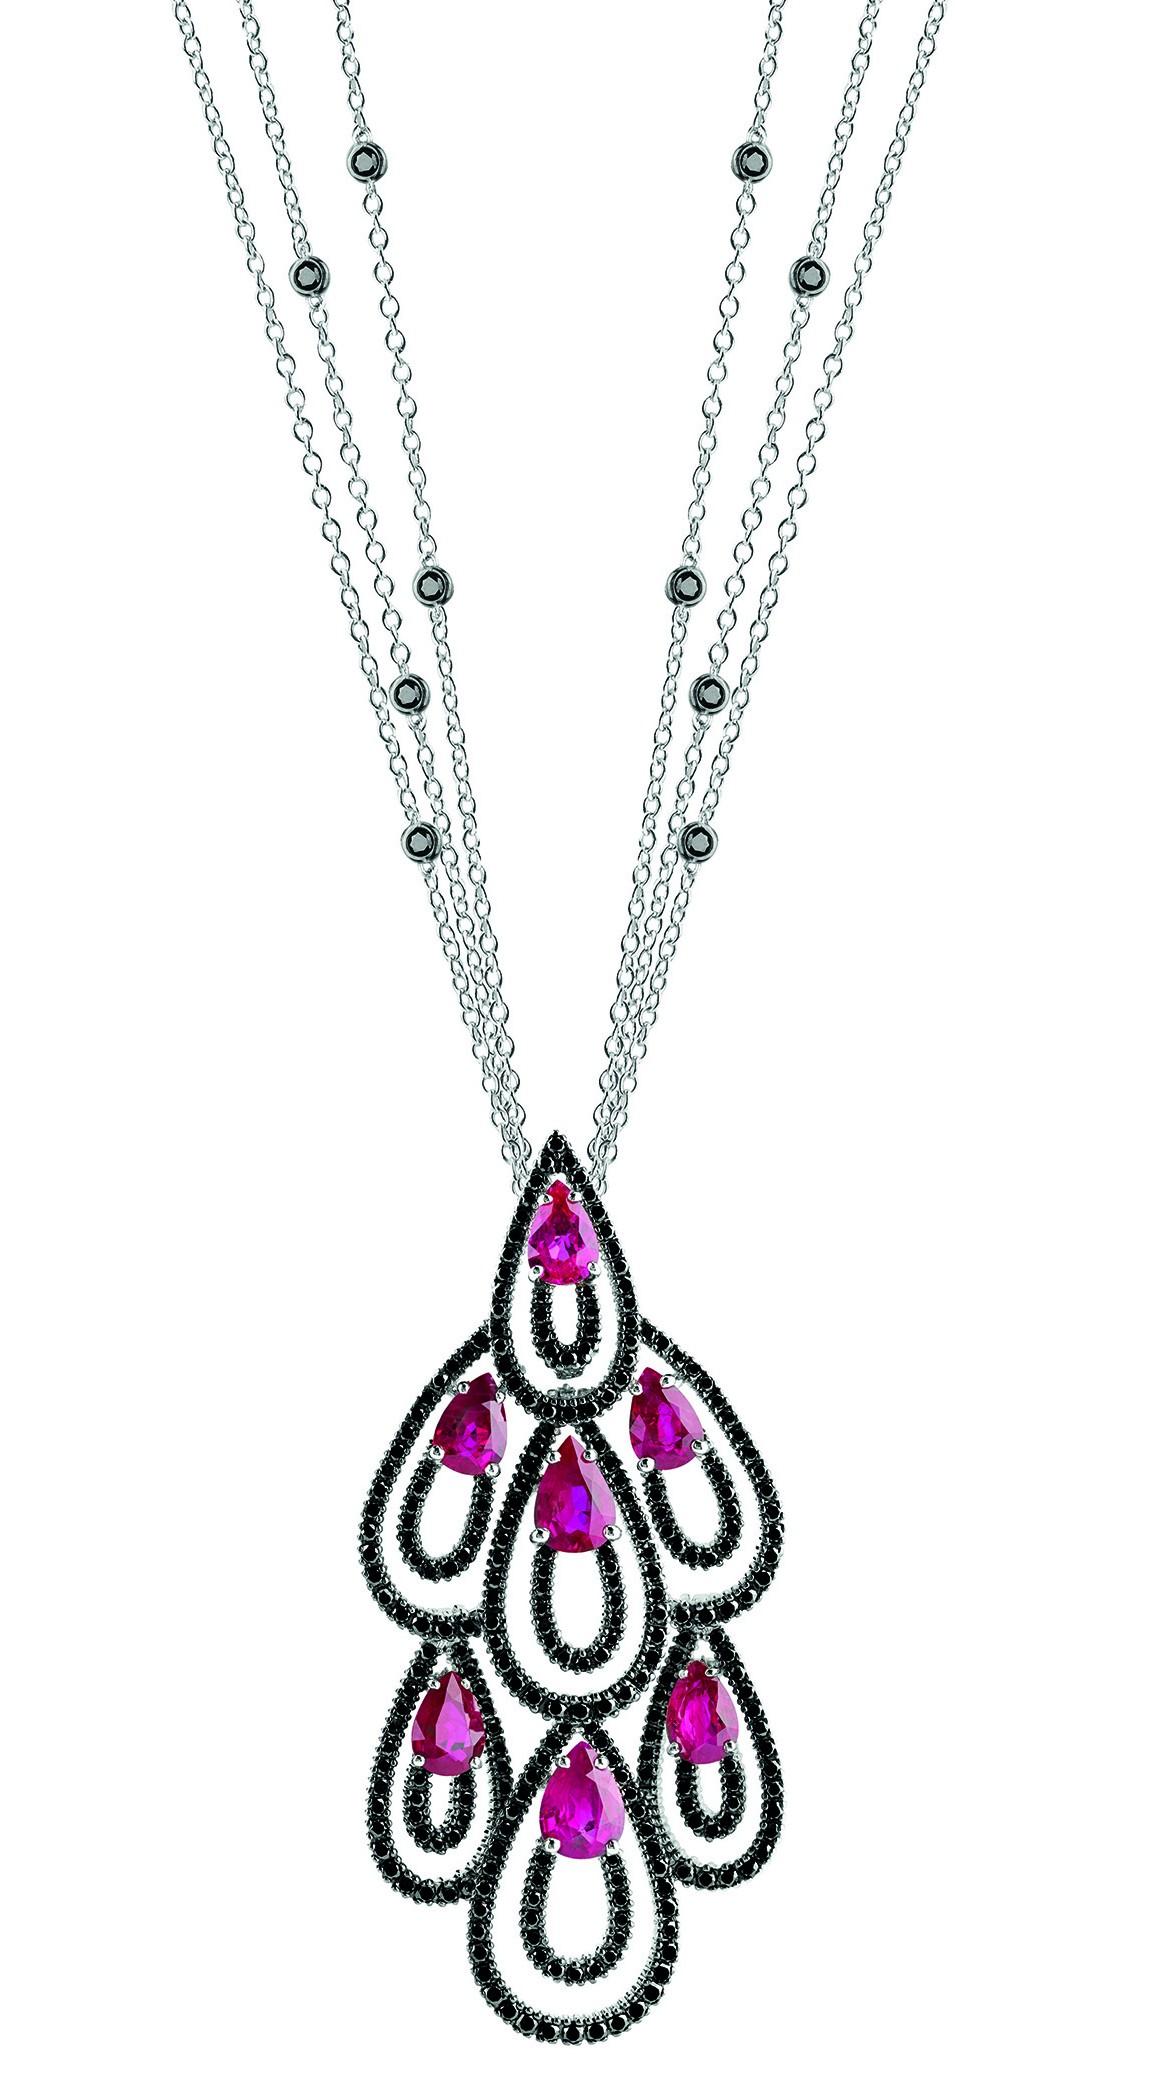 Damiani - Drip Drop masterpiece - white gold pendant with black diamonds and rubies